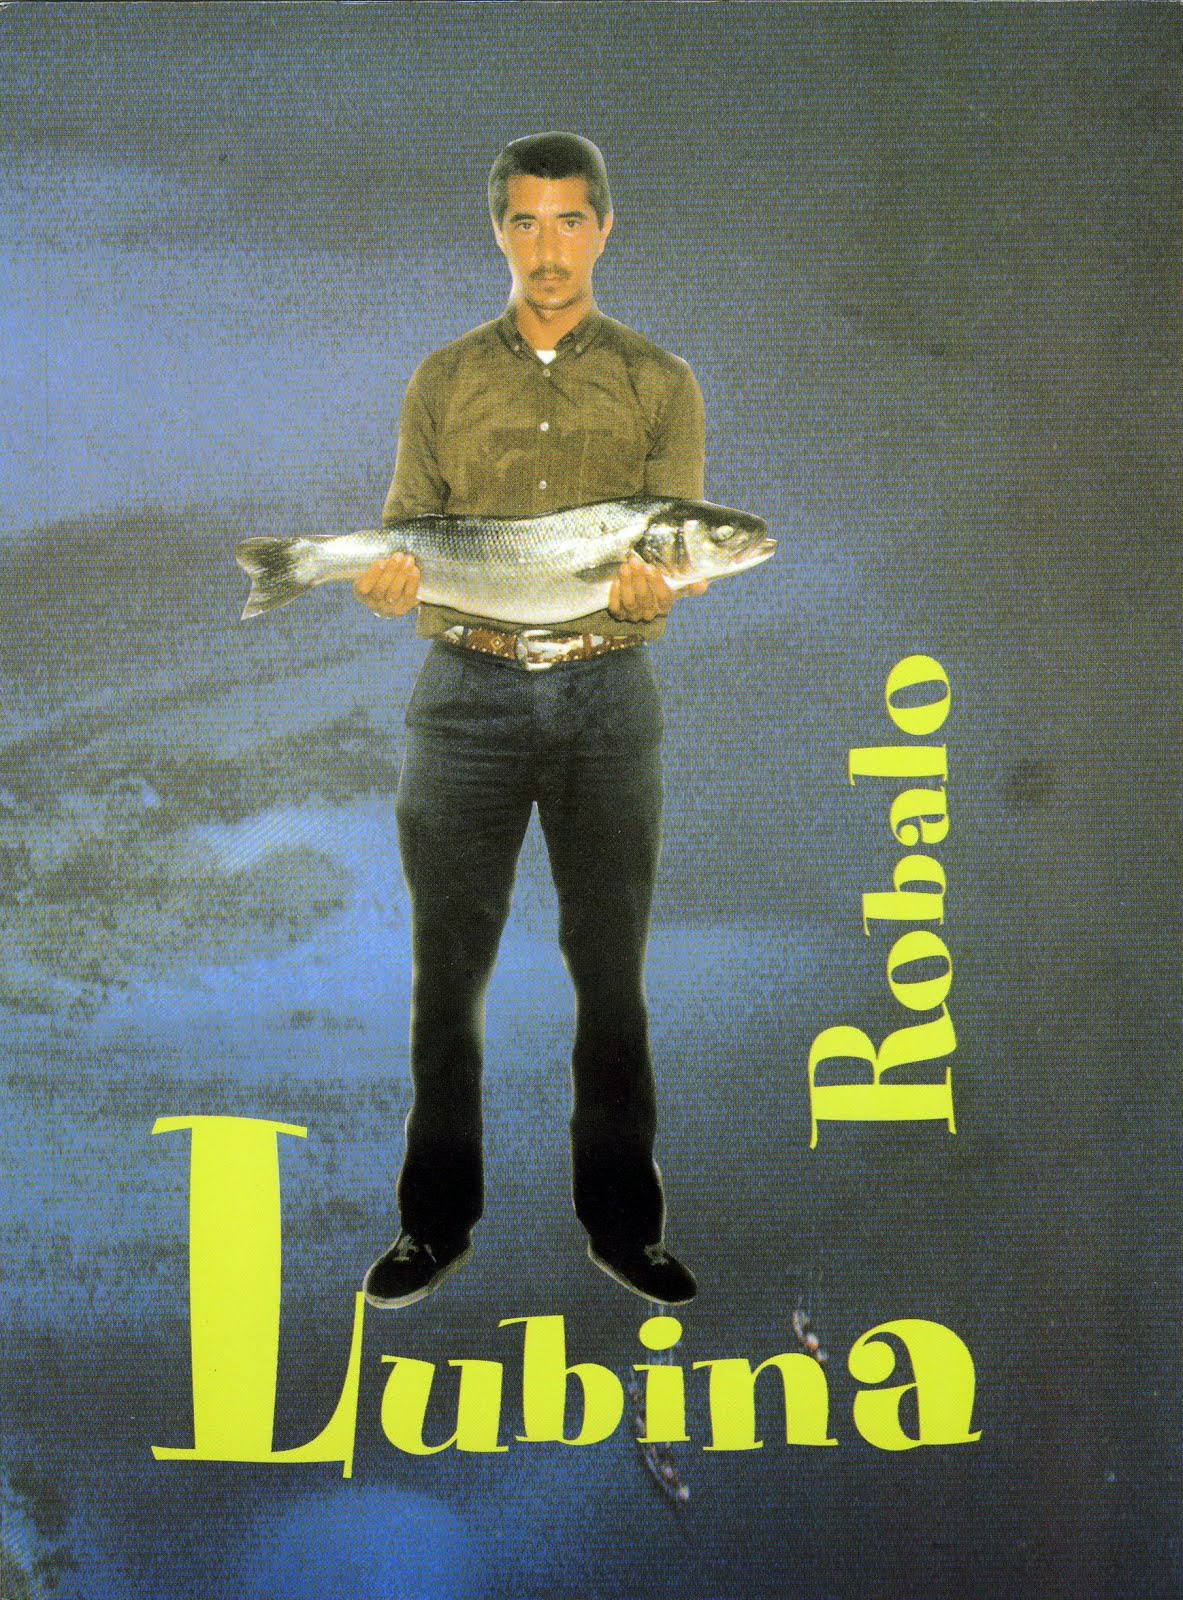 LUBINA